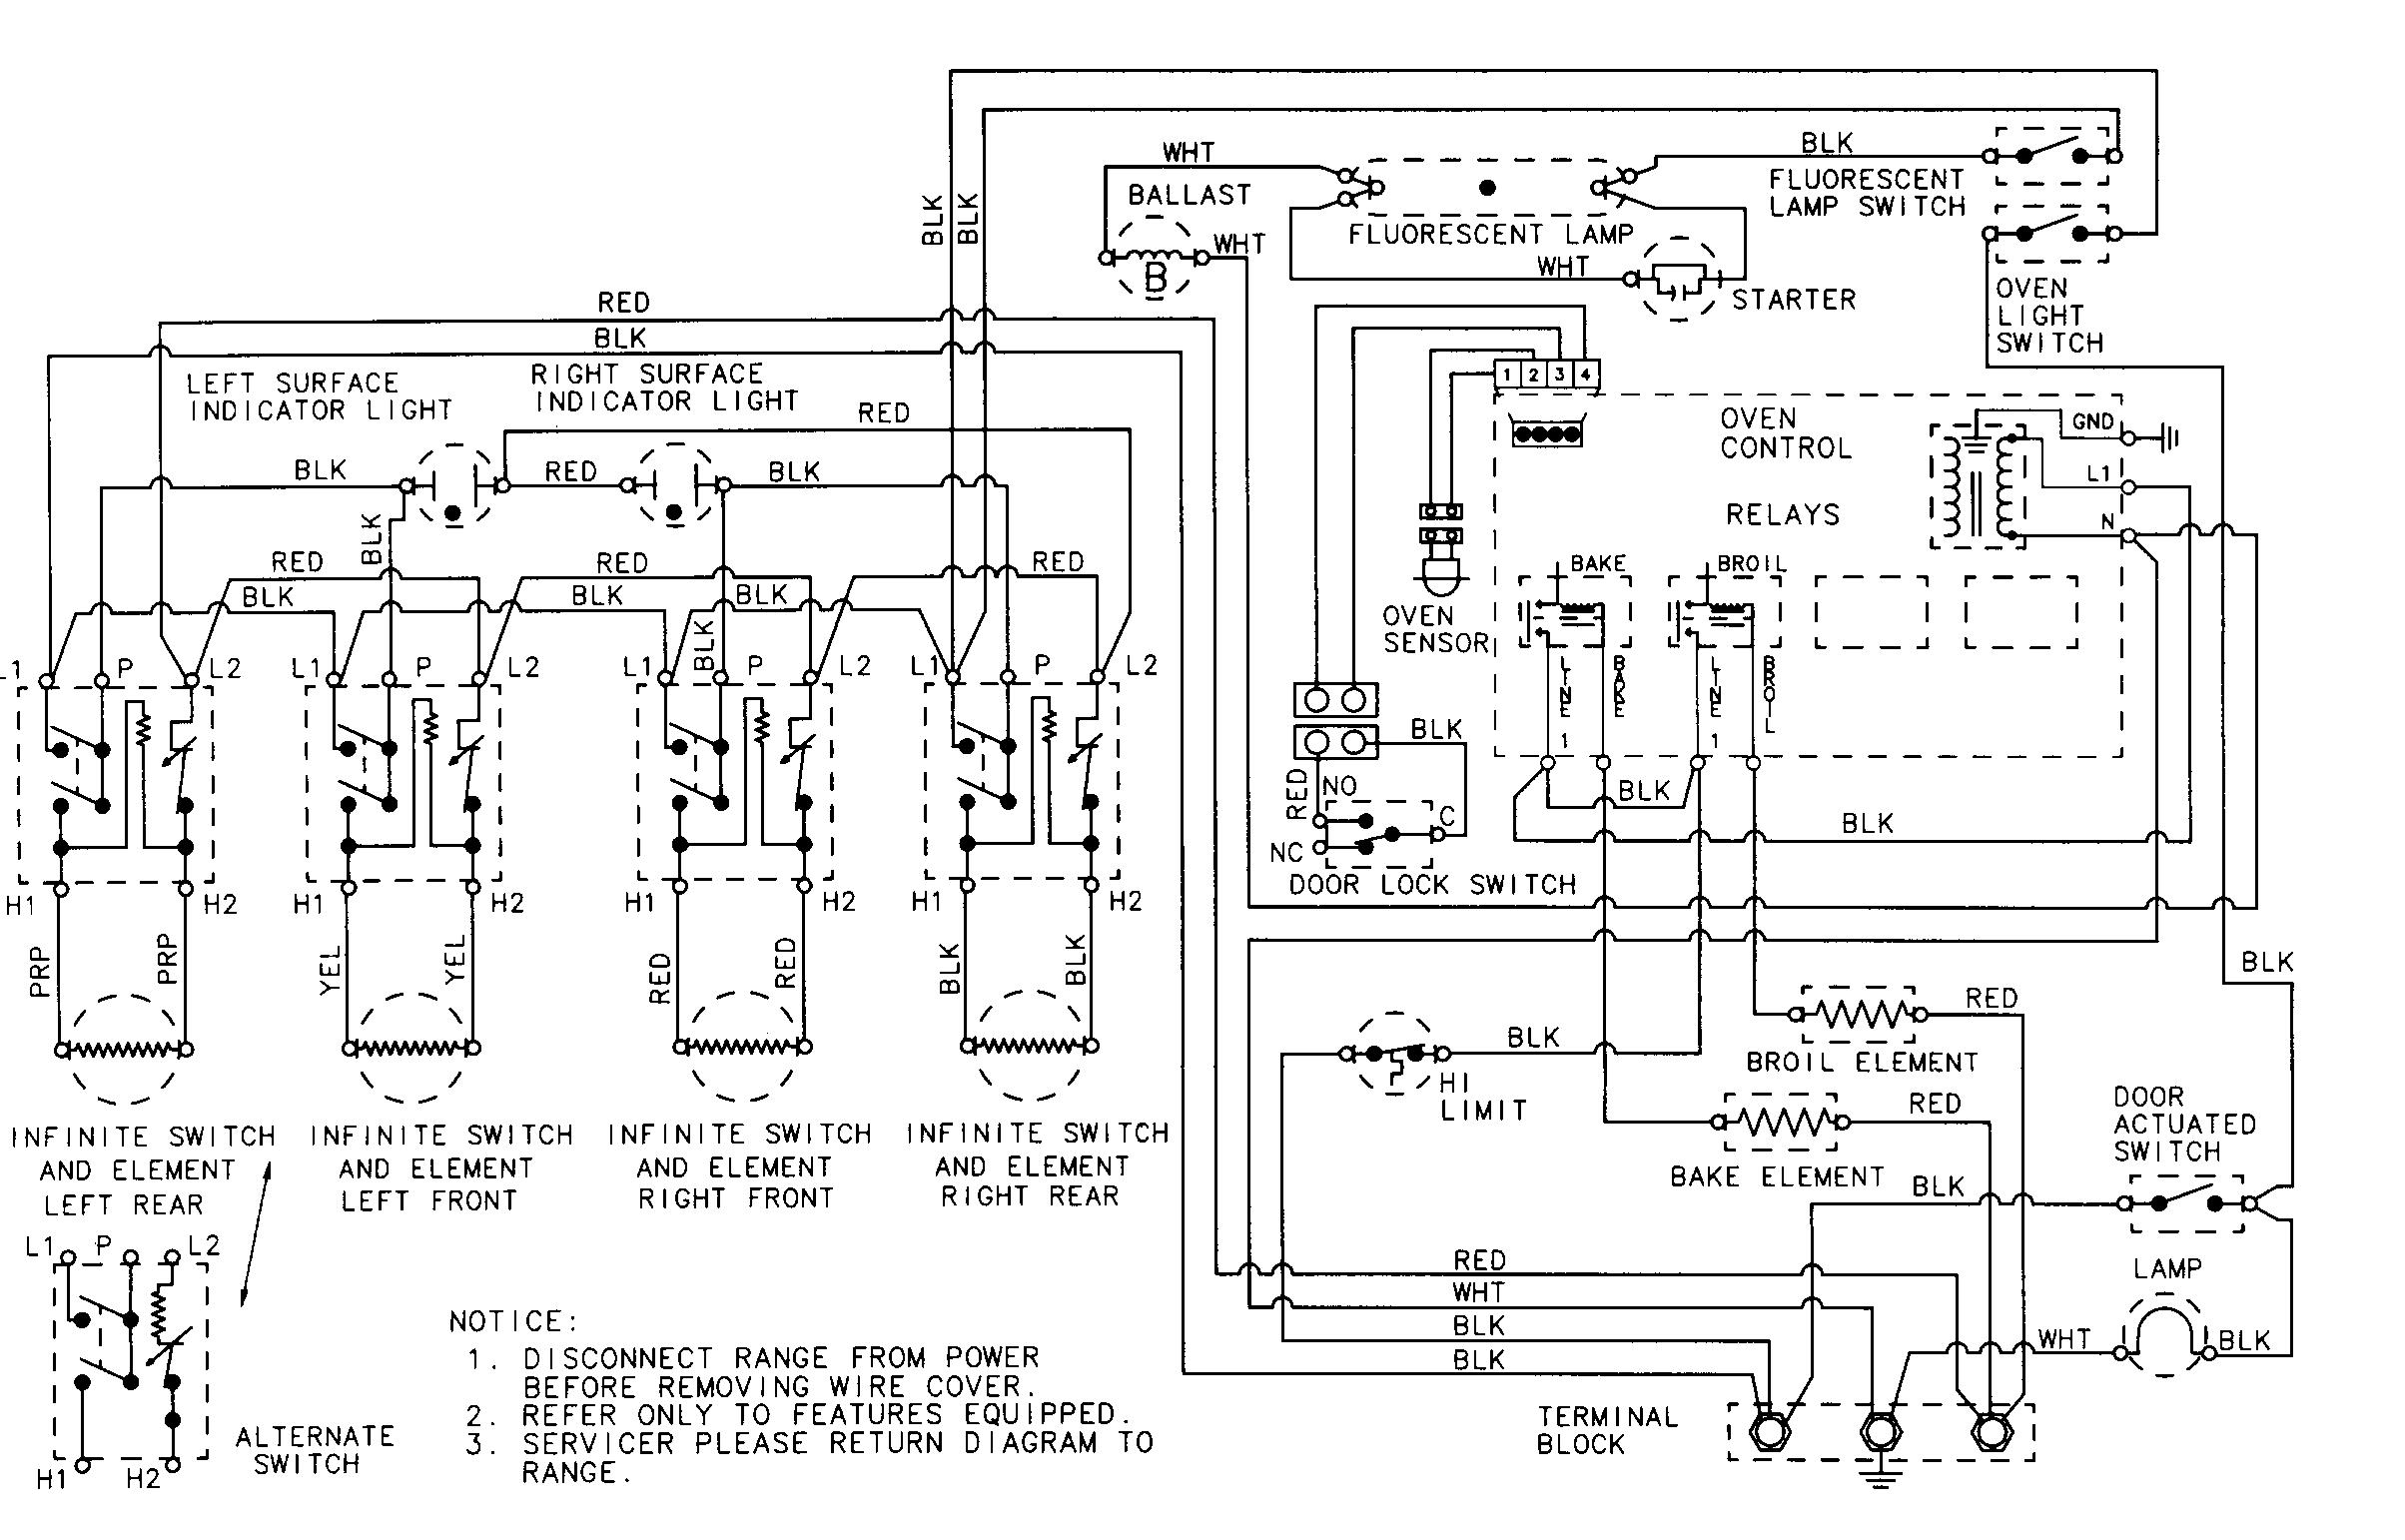 wiring information parts?resize=665%2C426&ssl=1 terrific baking oven wiring diagram photos wiring schematic spray bake oven wiring diagram at eliteediting.co